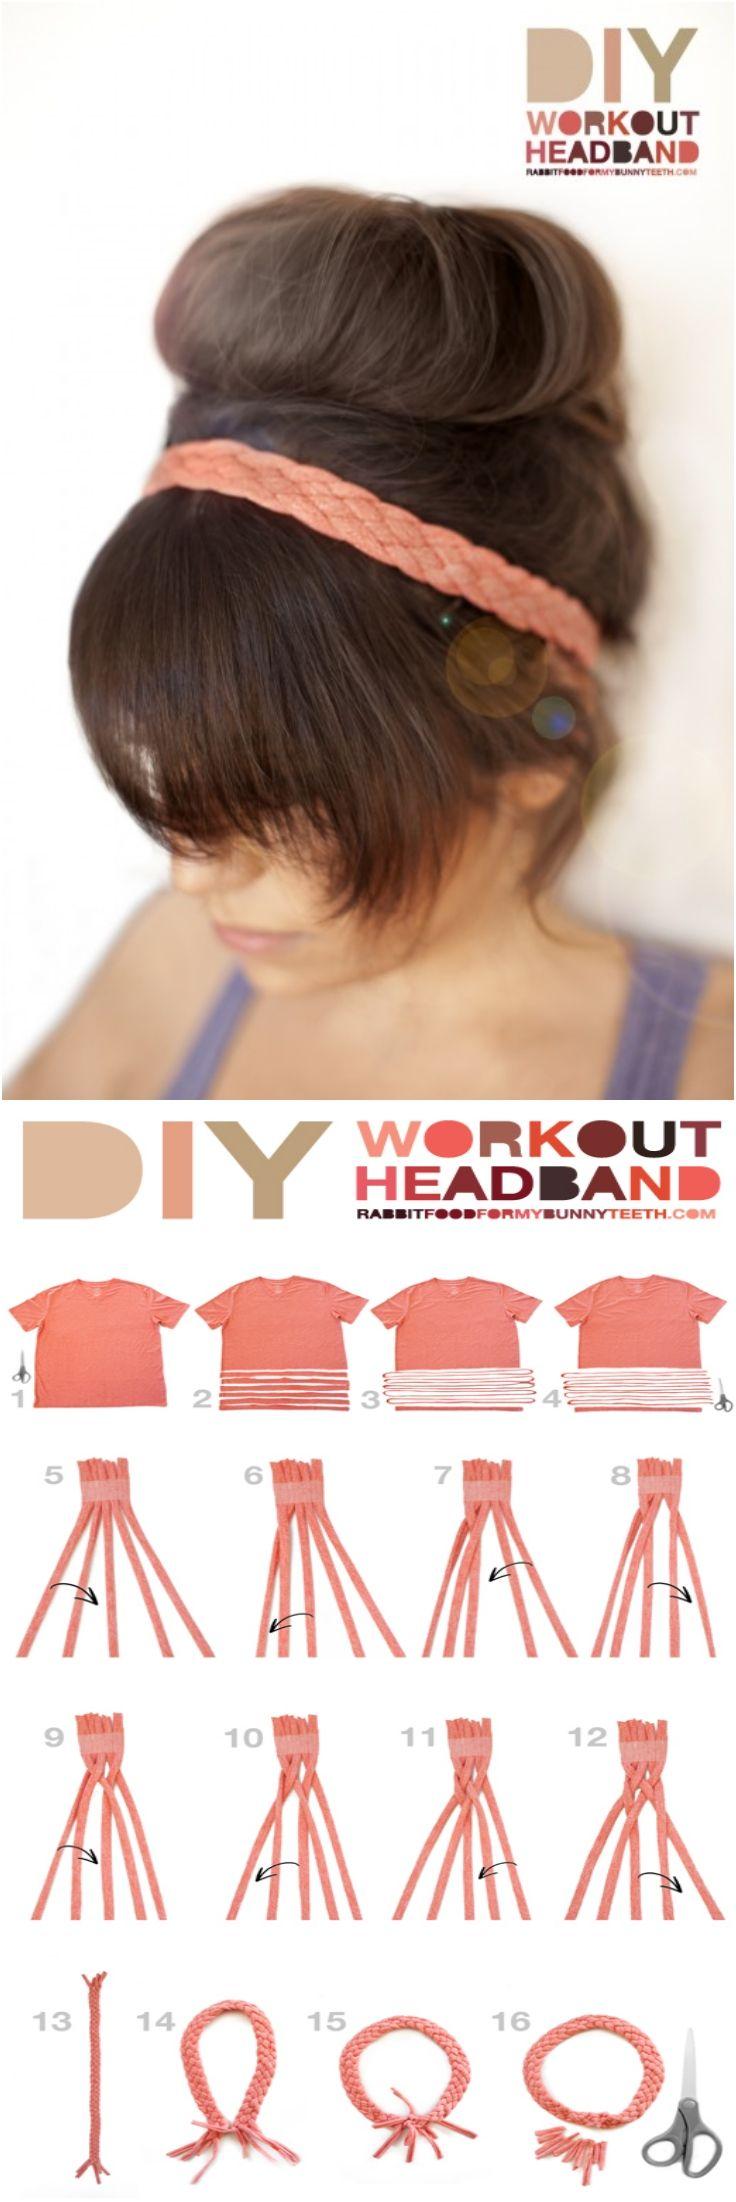 DIY Workout Headband.